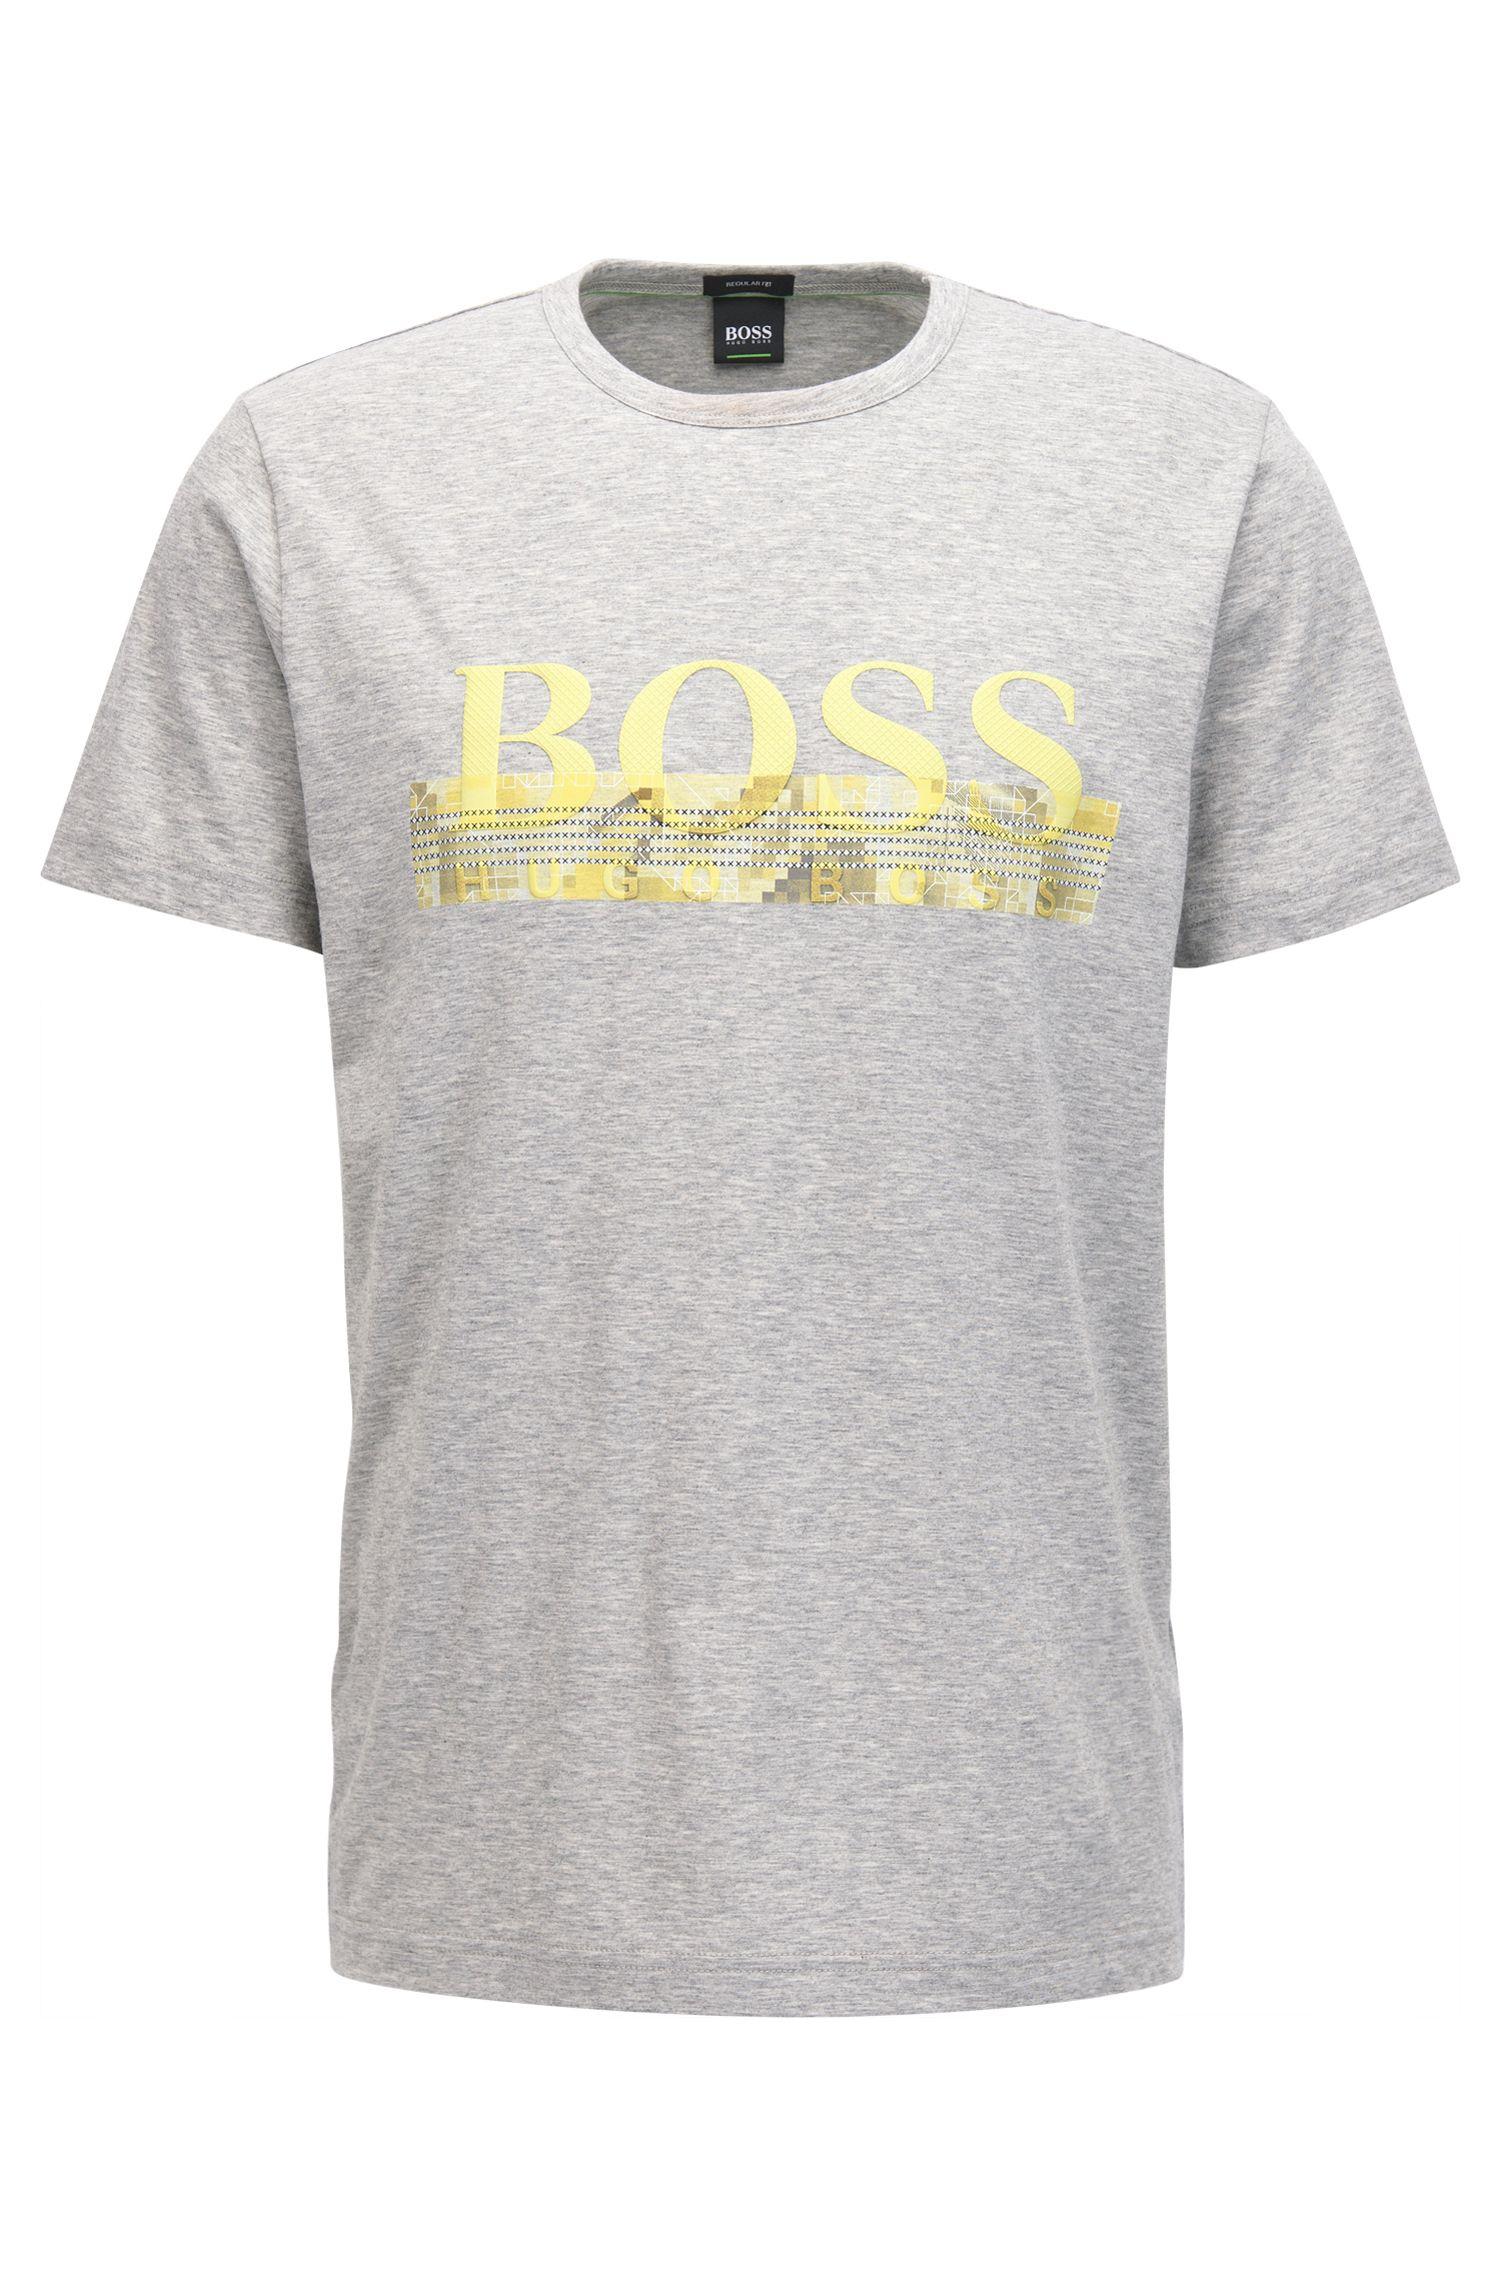 Cotton Graphic T-Shirt | Tee, Light Grey